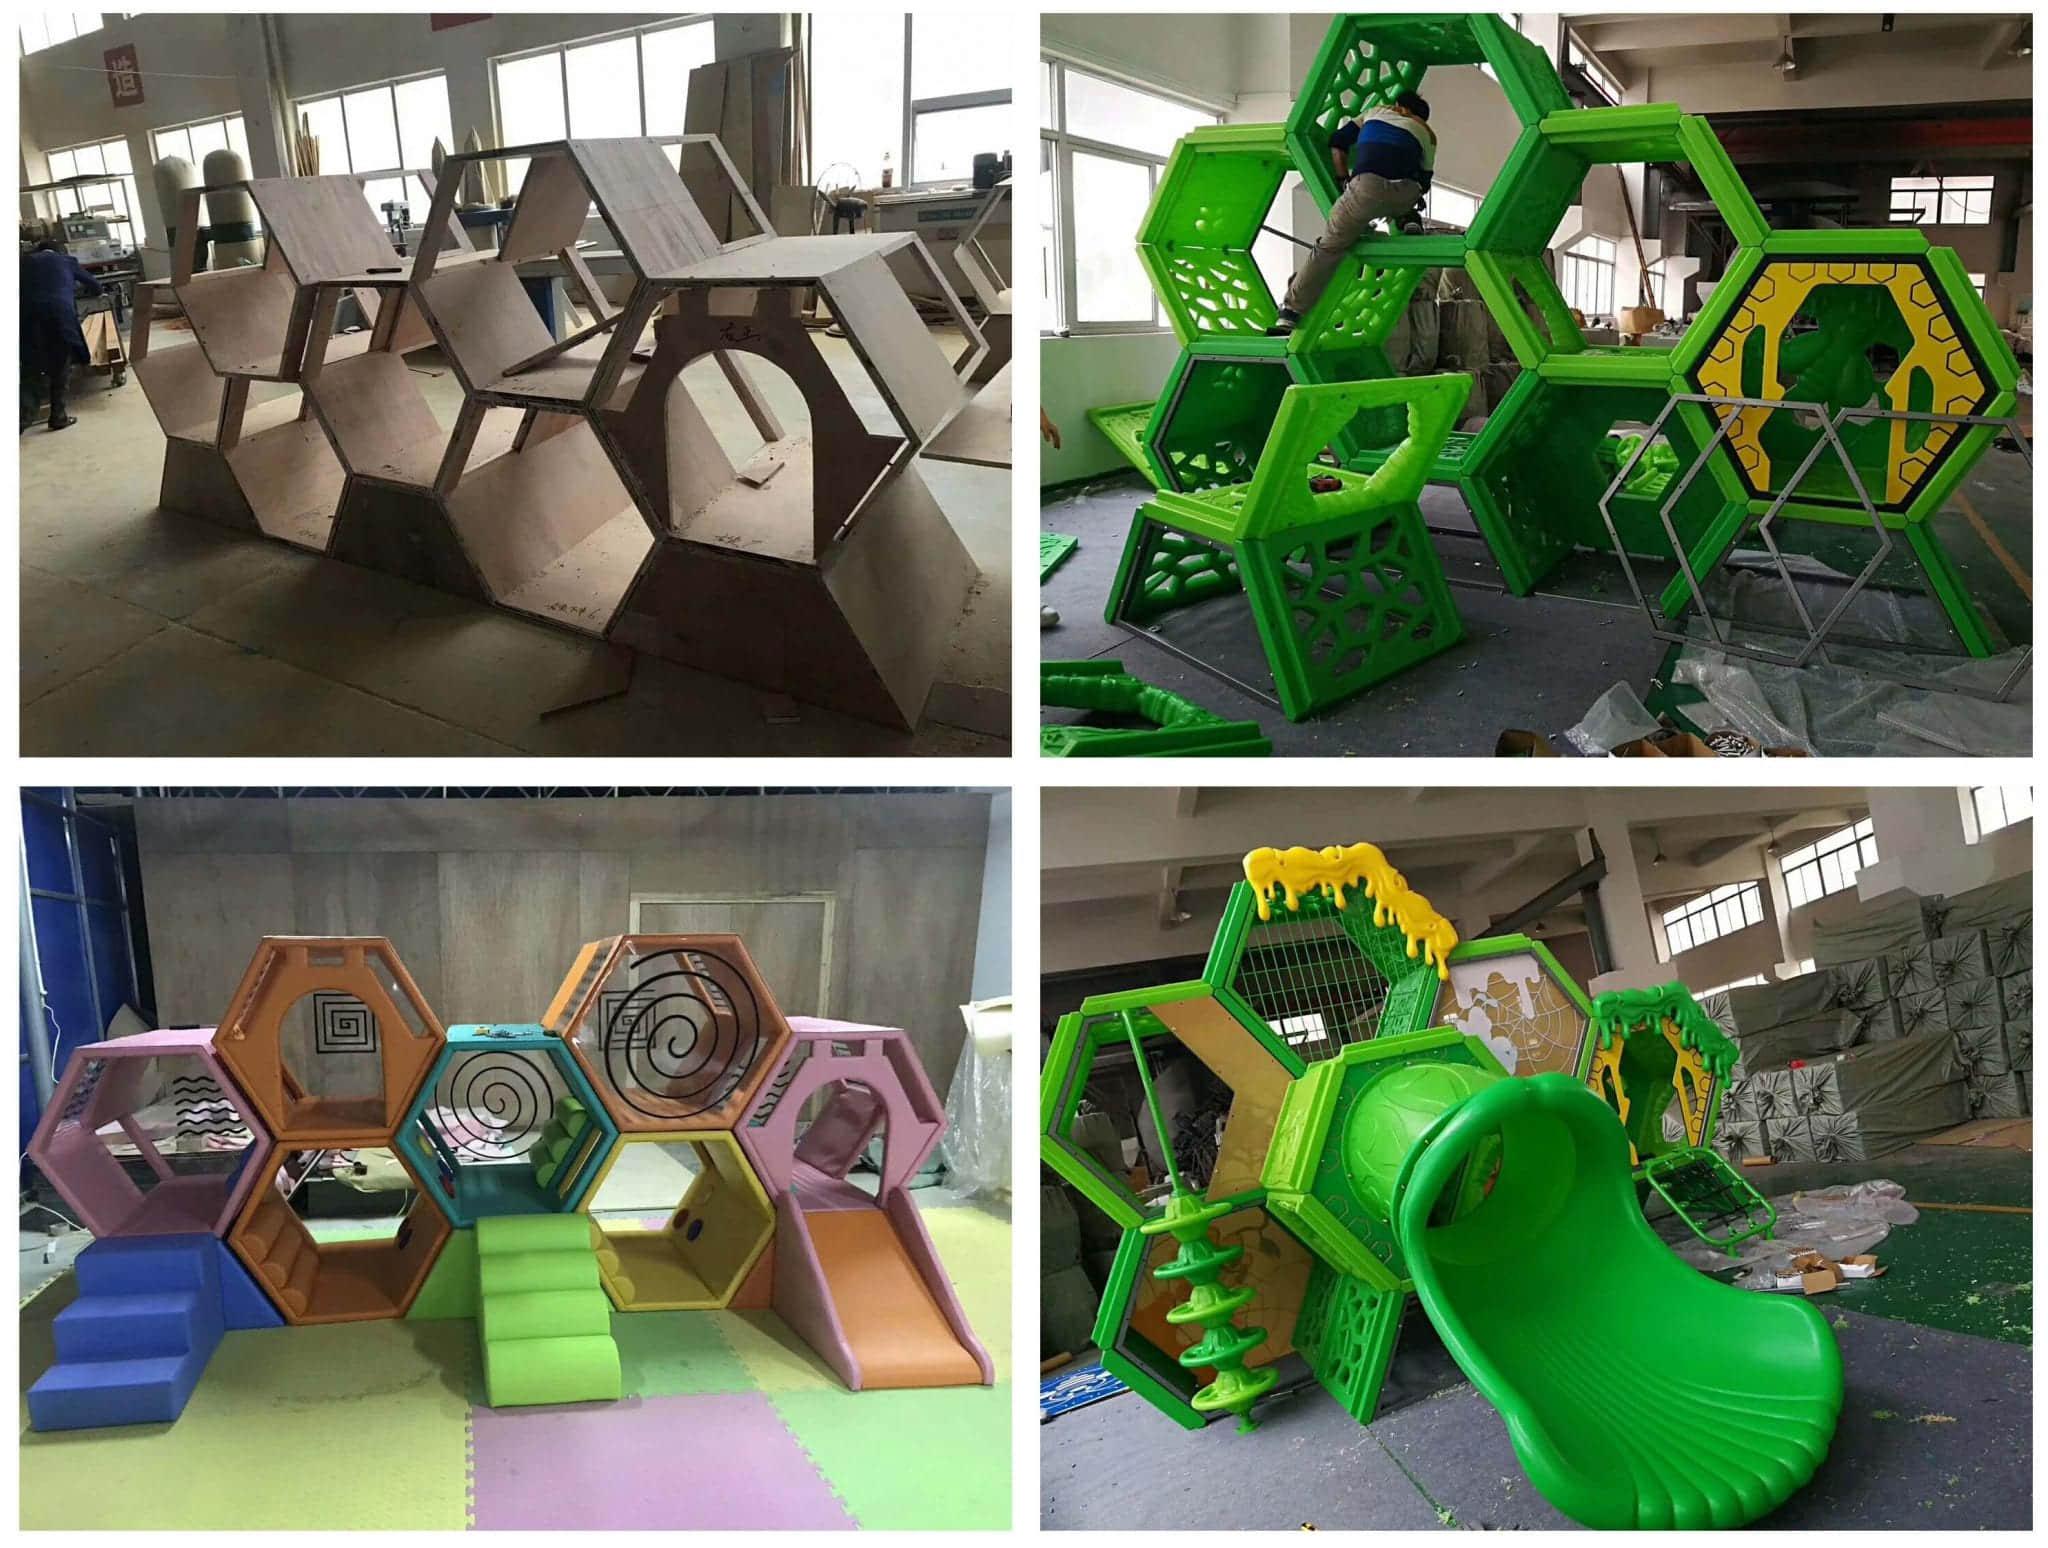 Maze the latest indoor playground equipment